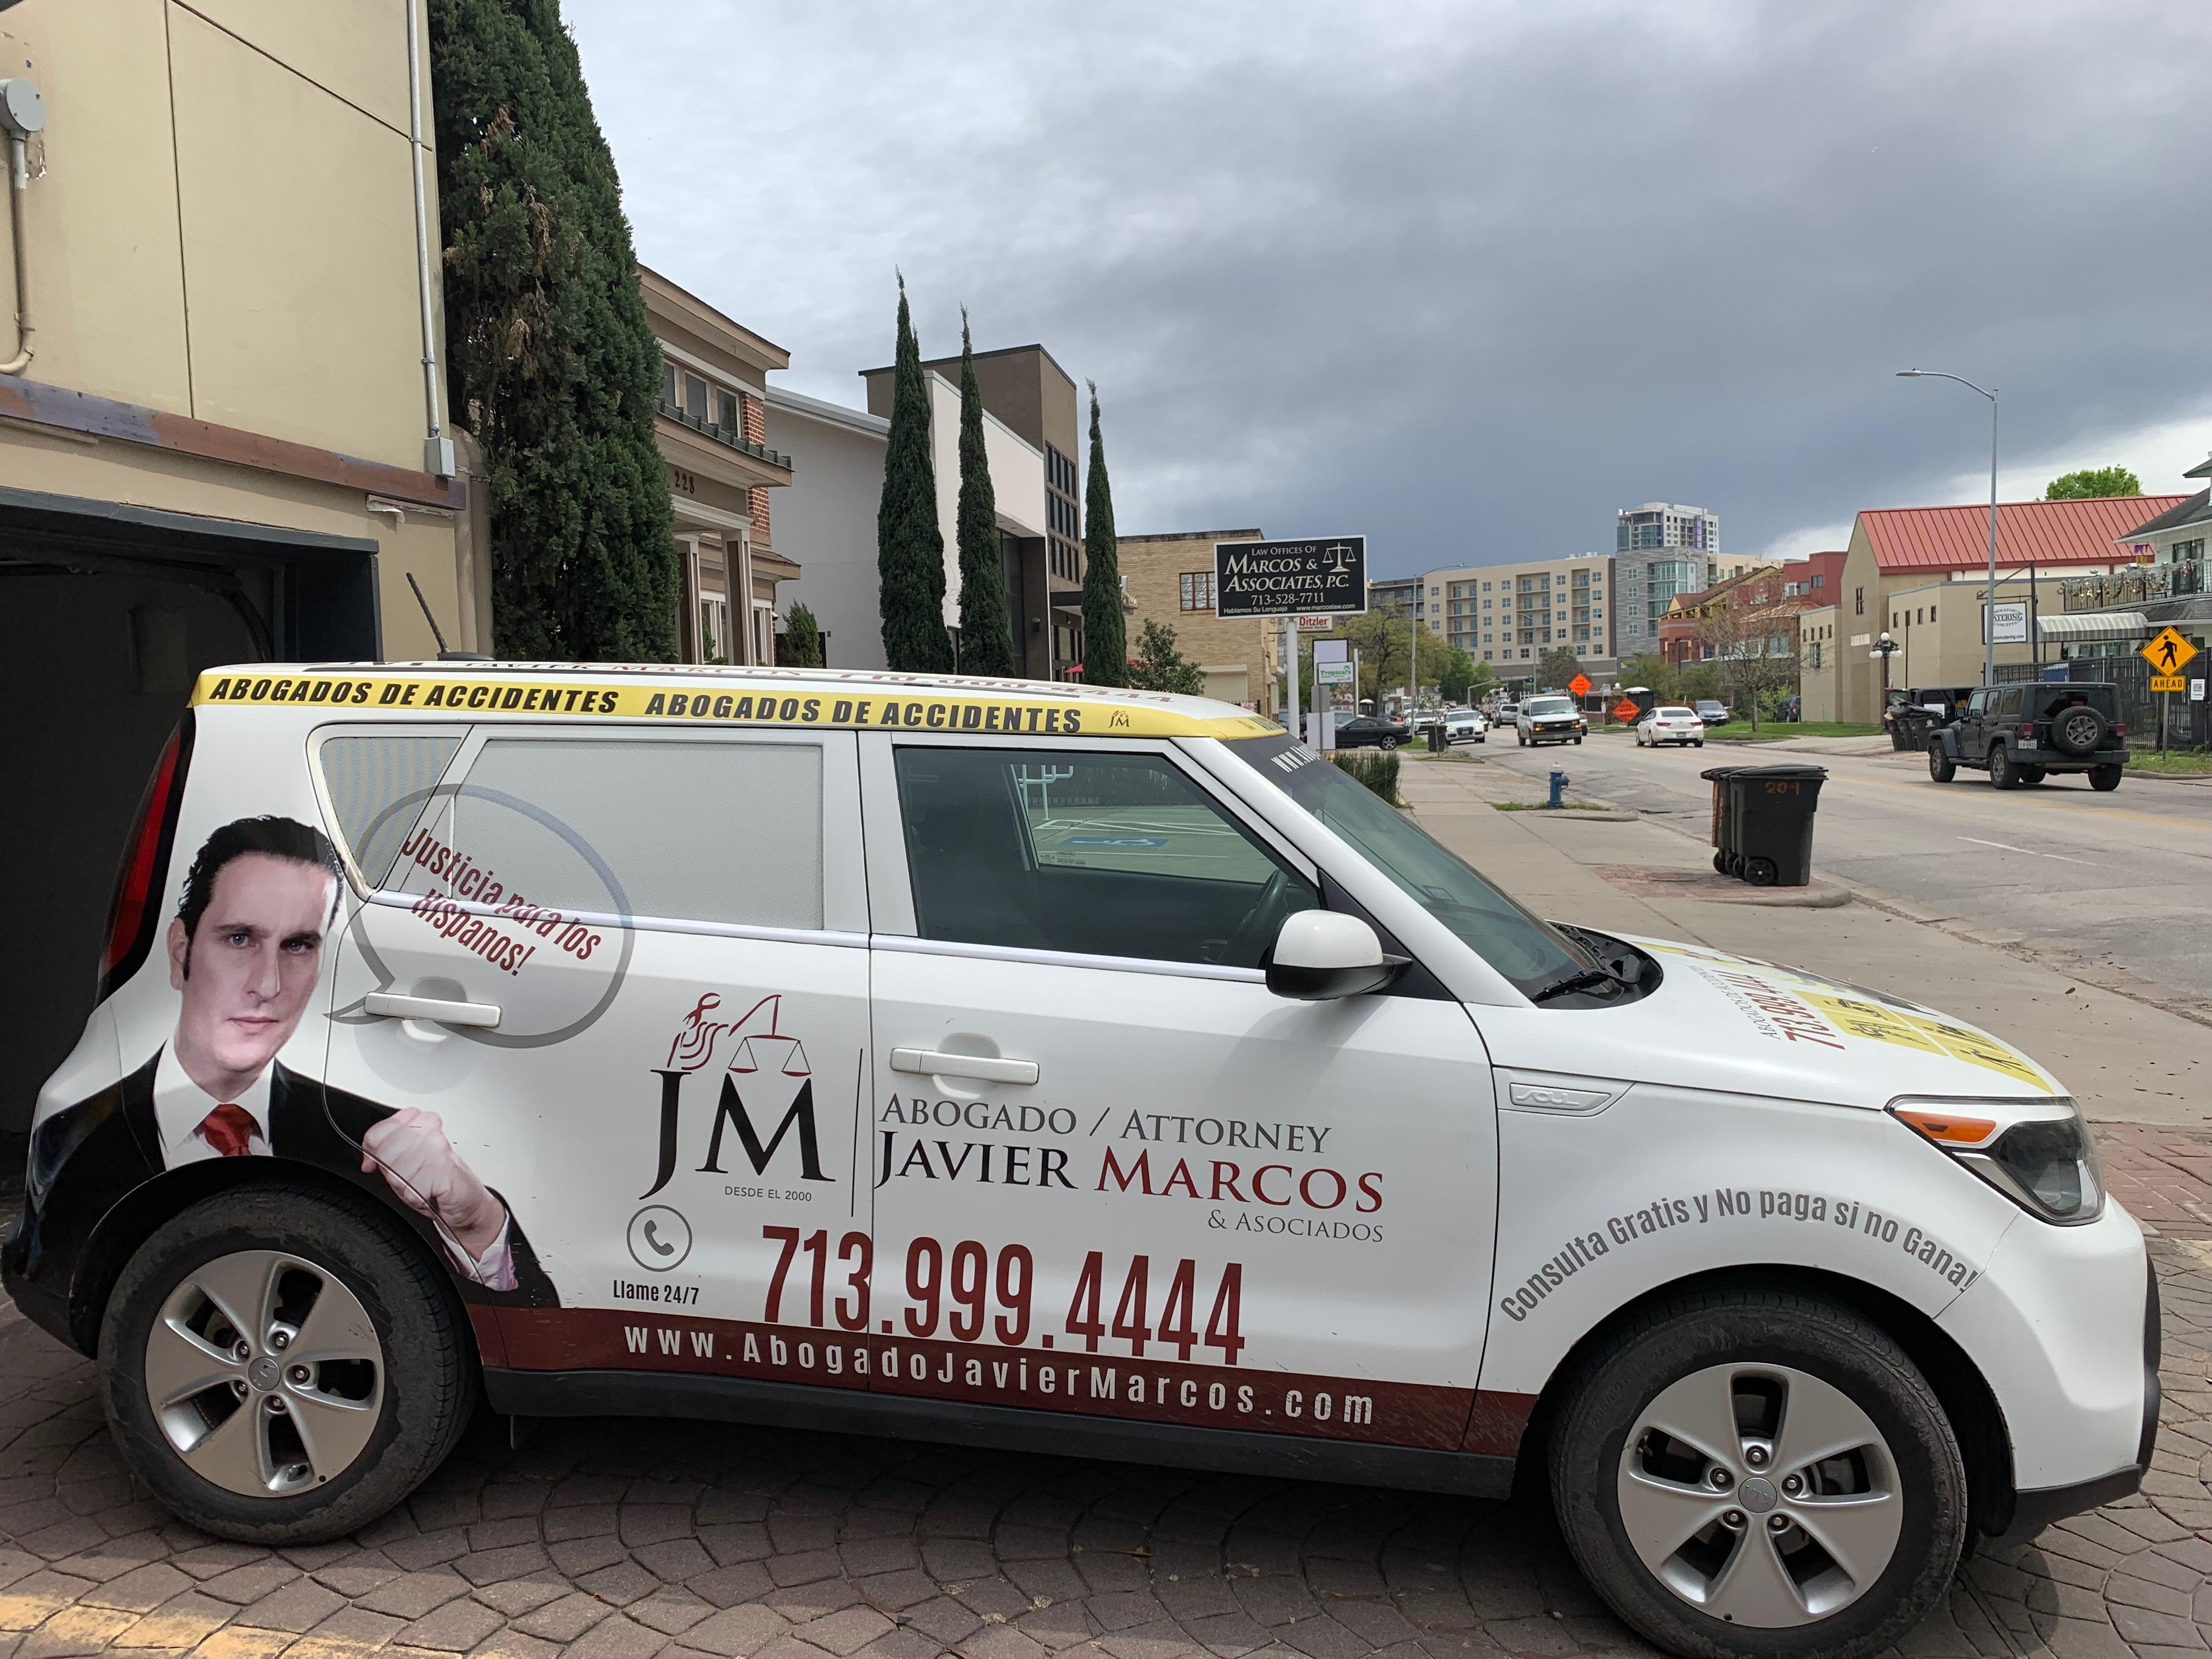 Explosion en Deer Park   Abogado Javier Marcos   713.999.4444